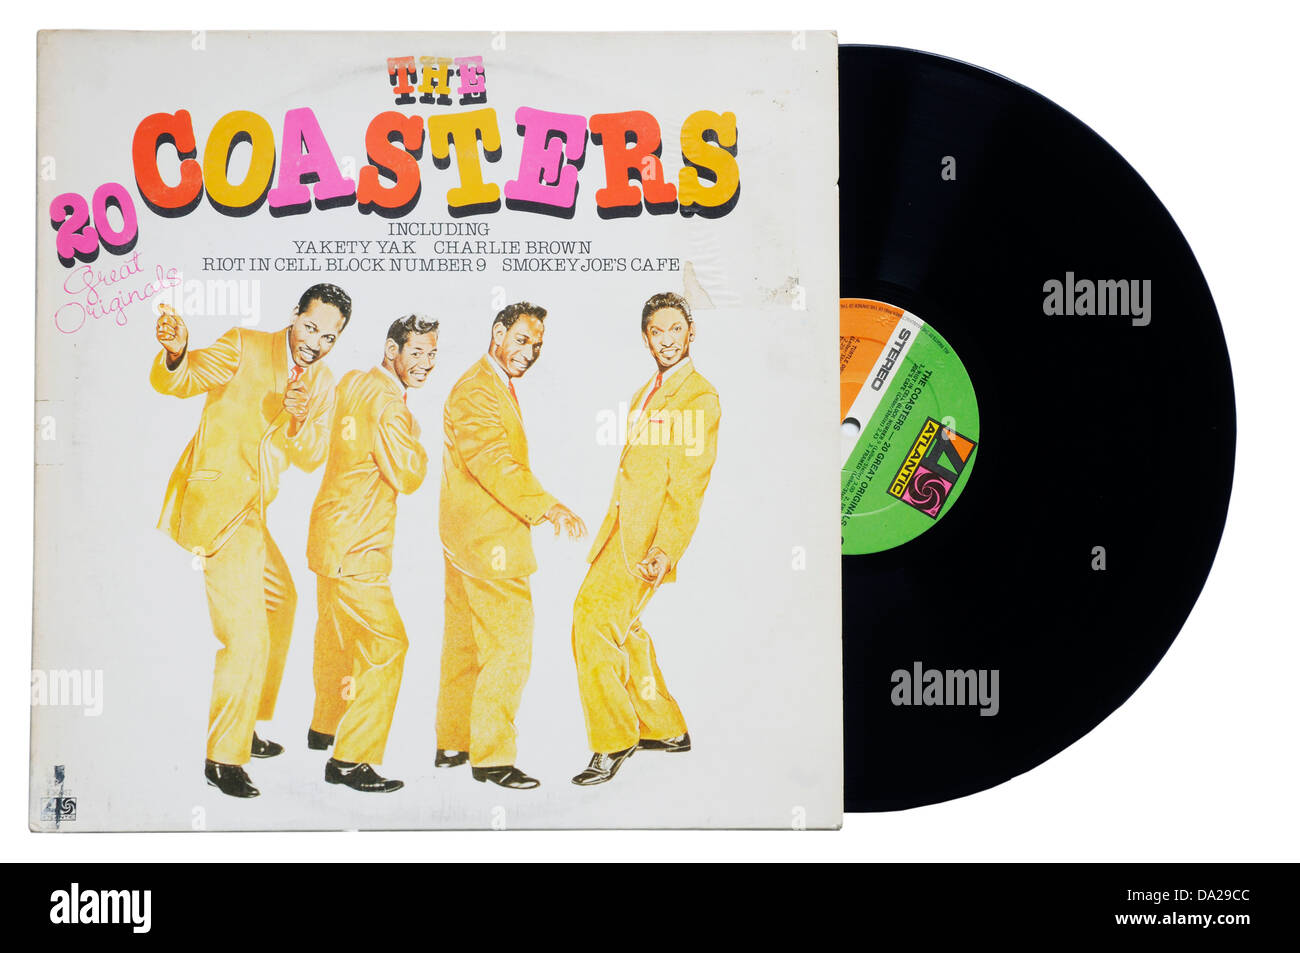 The Coasters Greatest Hits album - Stock Image